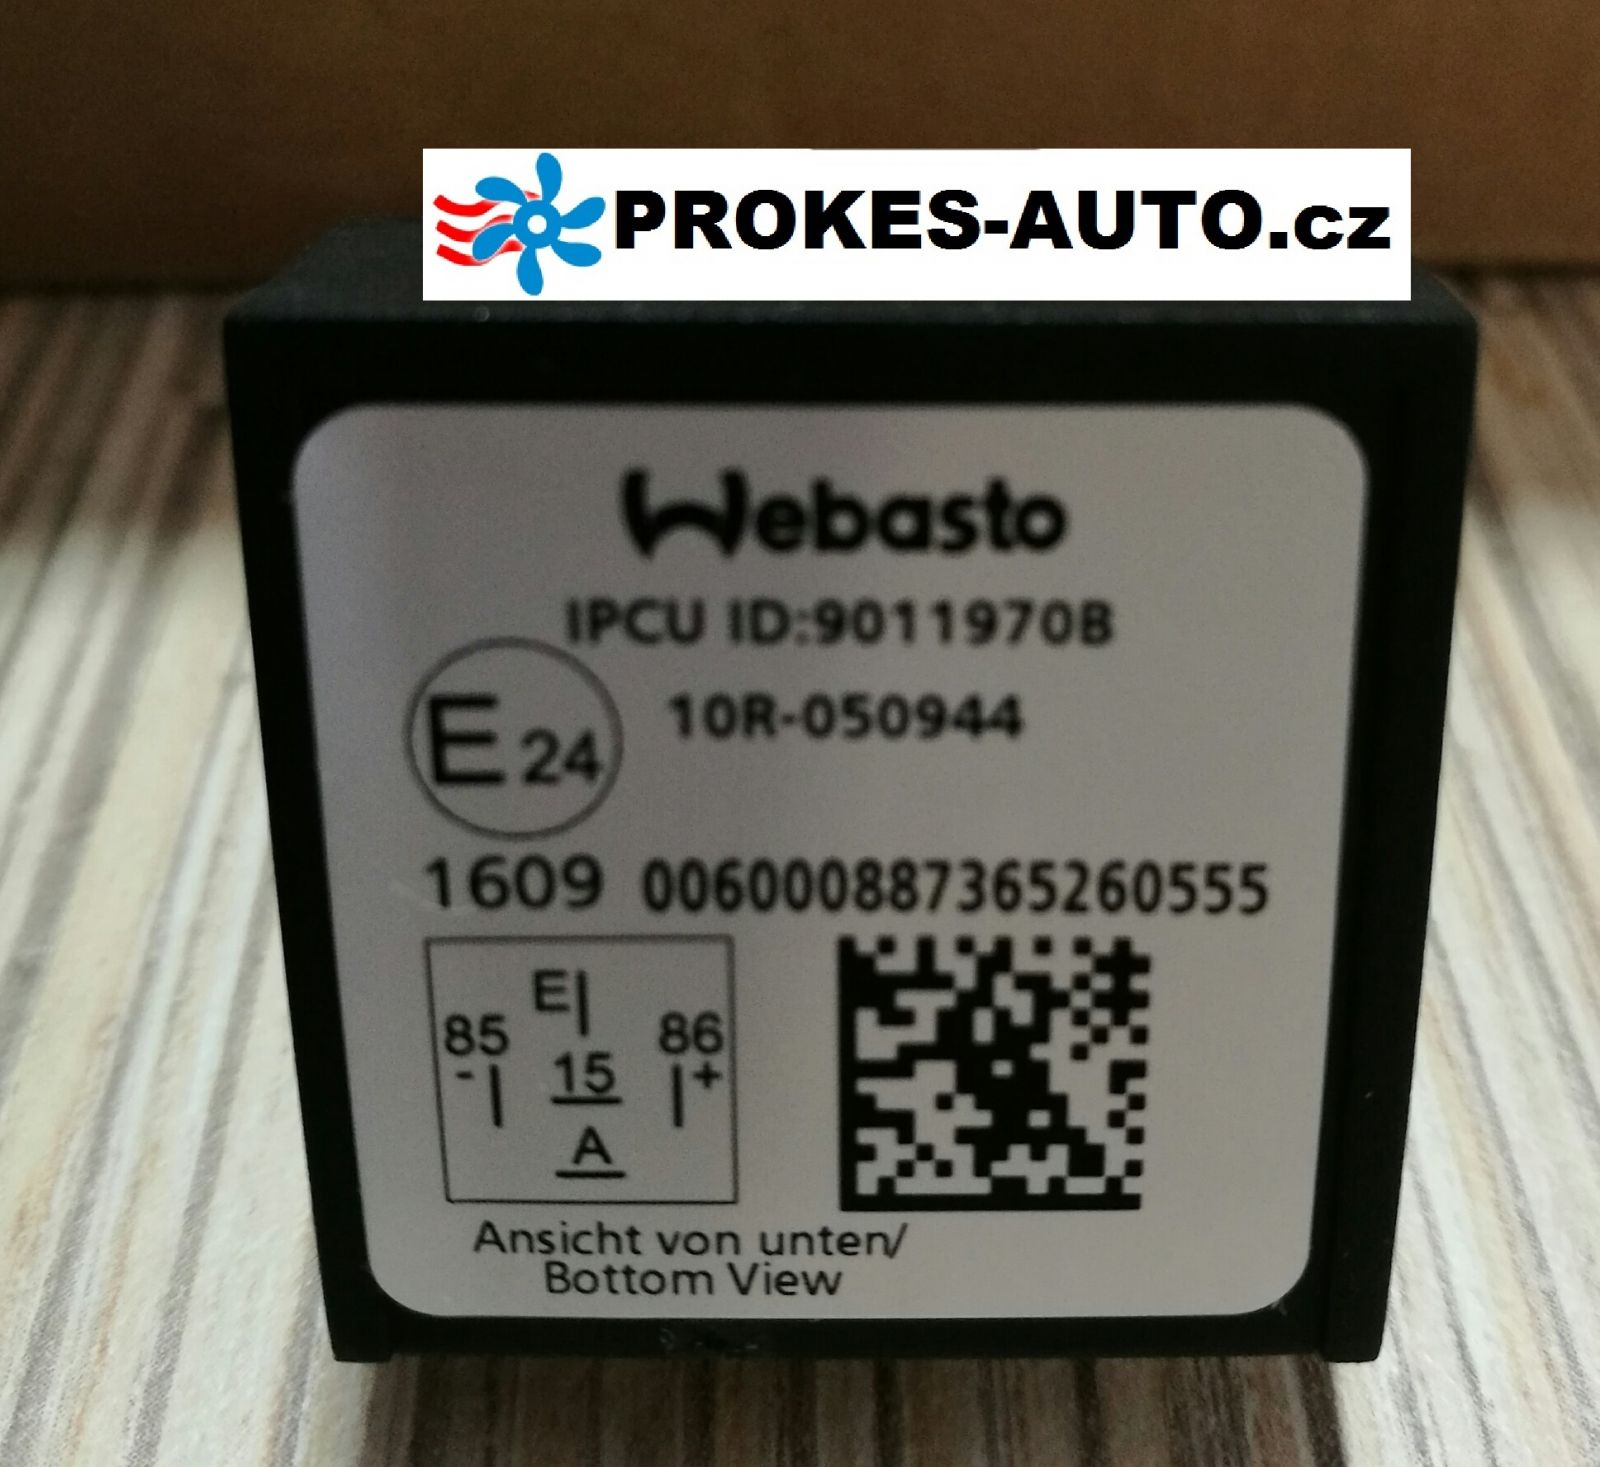 IPCU Modul 400HZ 1322640 / 9011970 Webasto